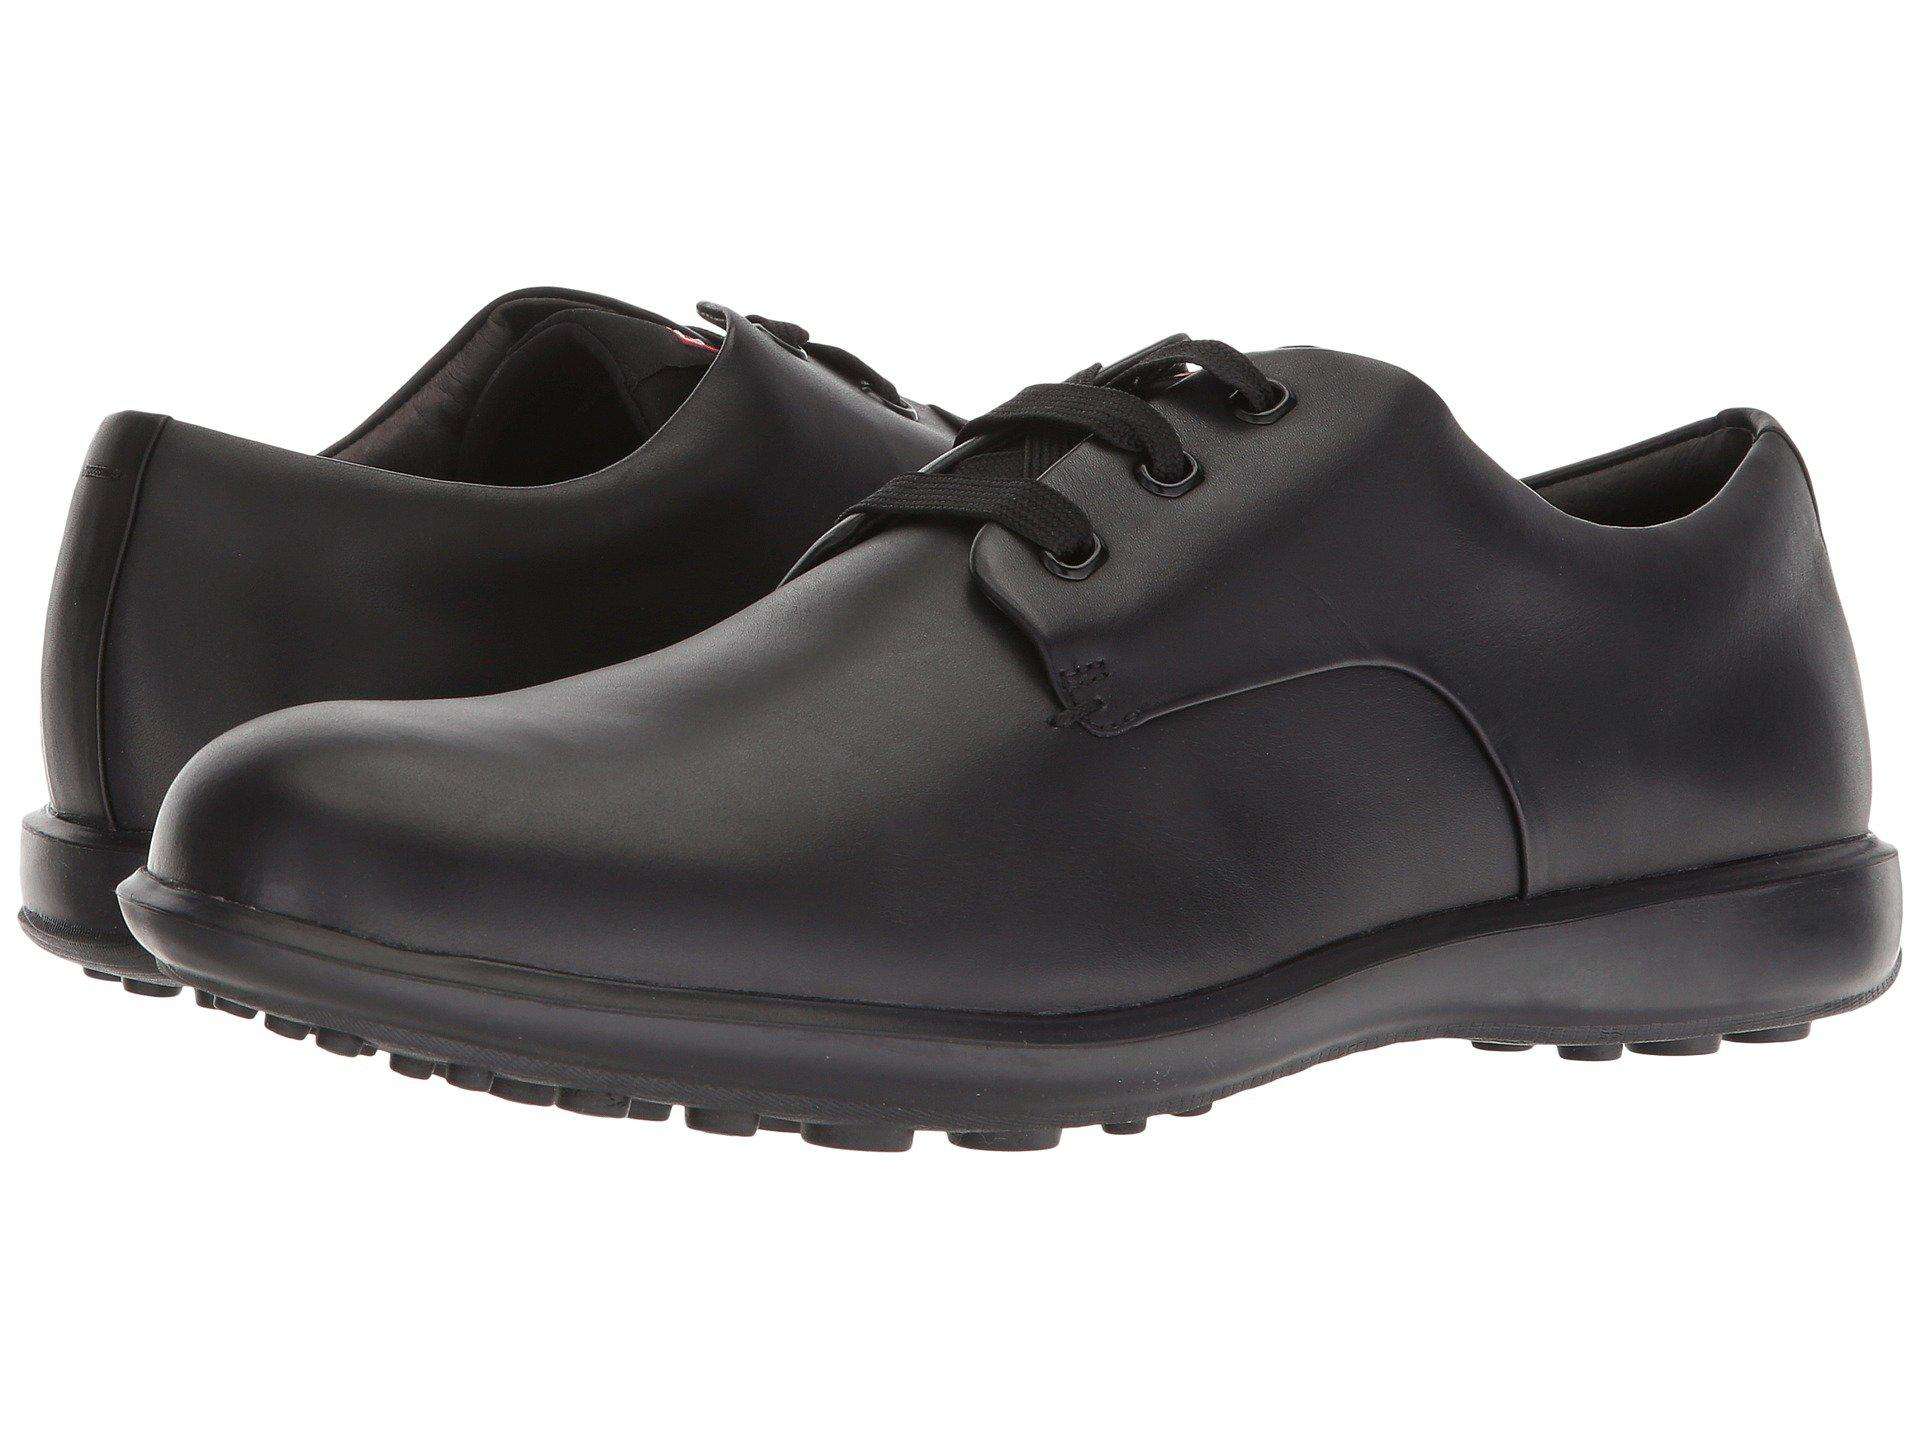 CAMPER Mateo Leather Flatform Oxford mcbSZfdB